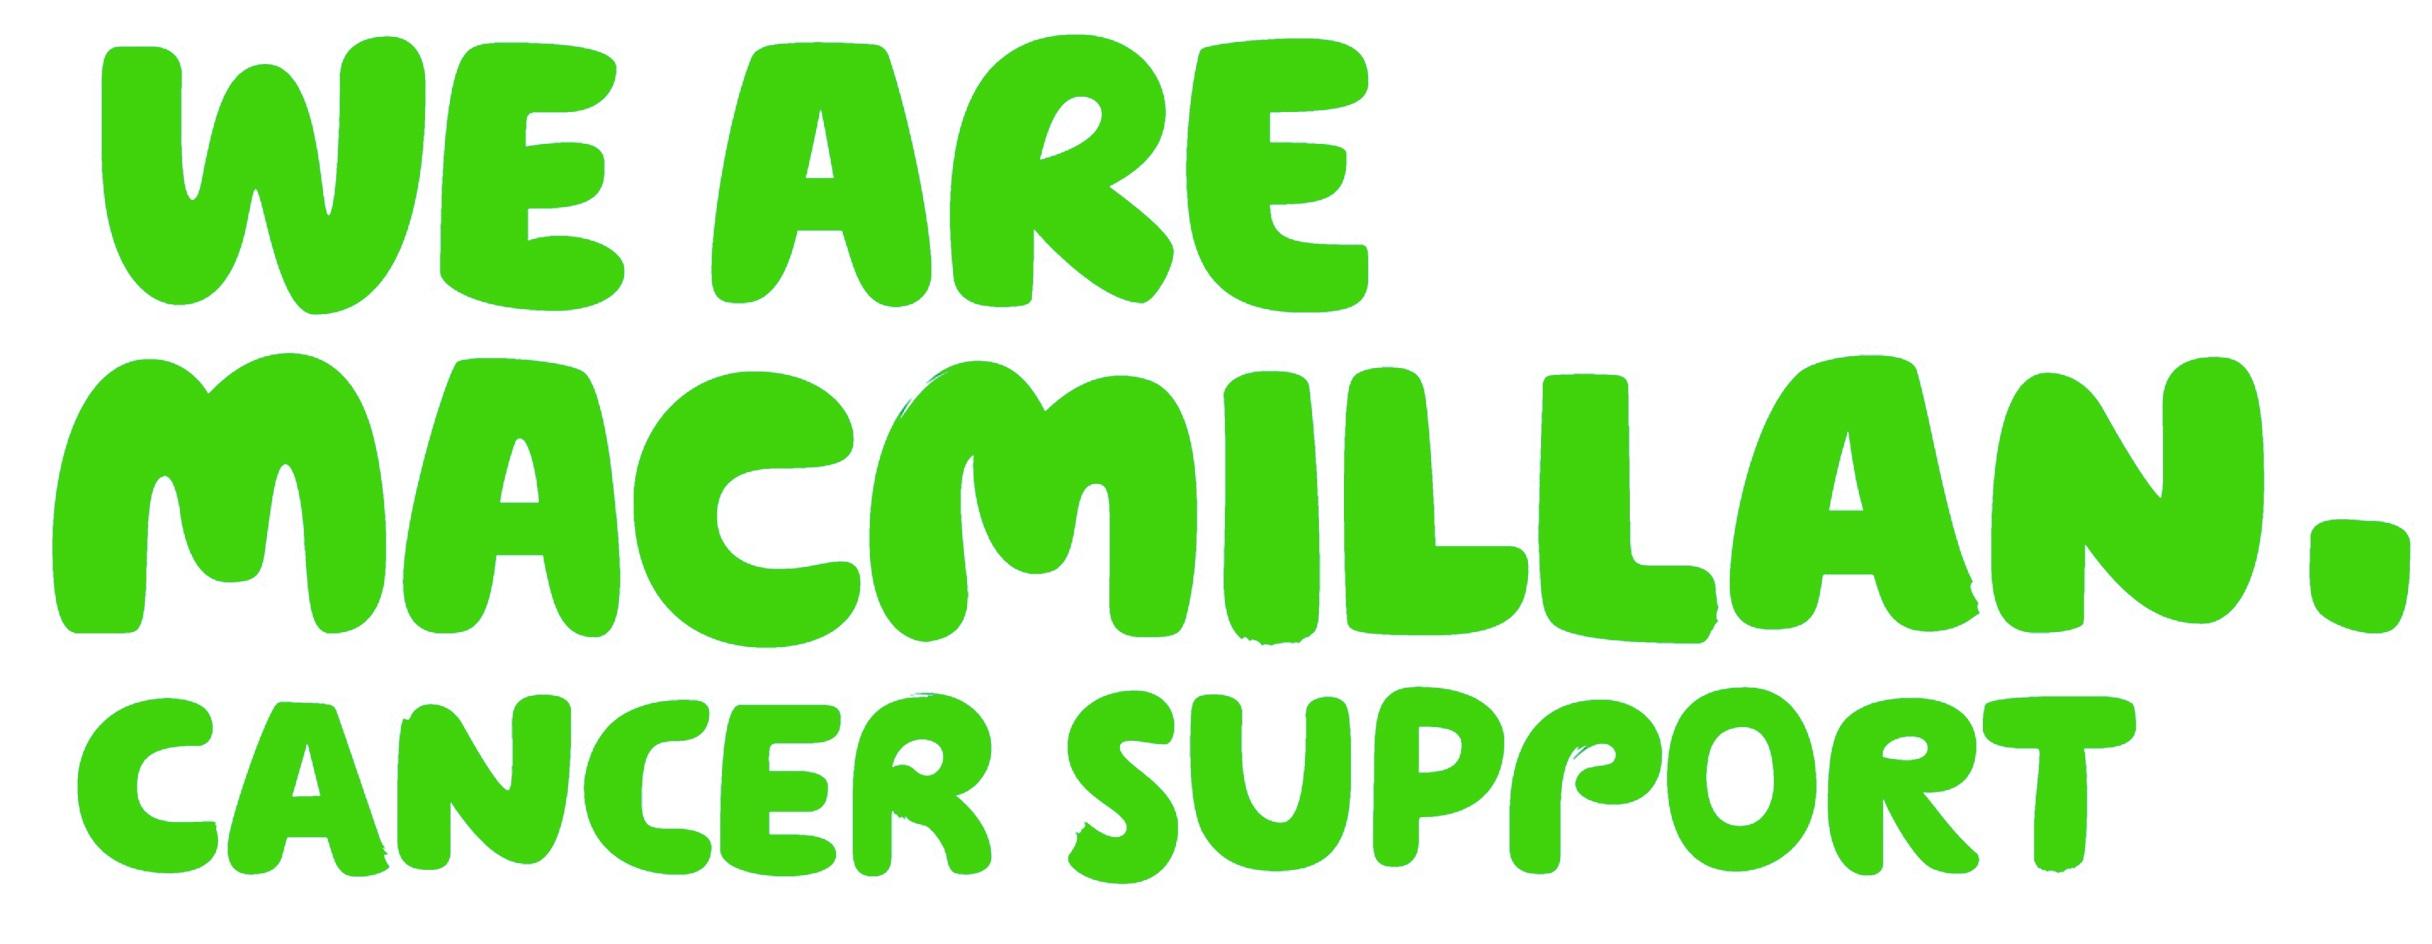 Consett Library Macmillan Cancer Support